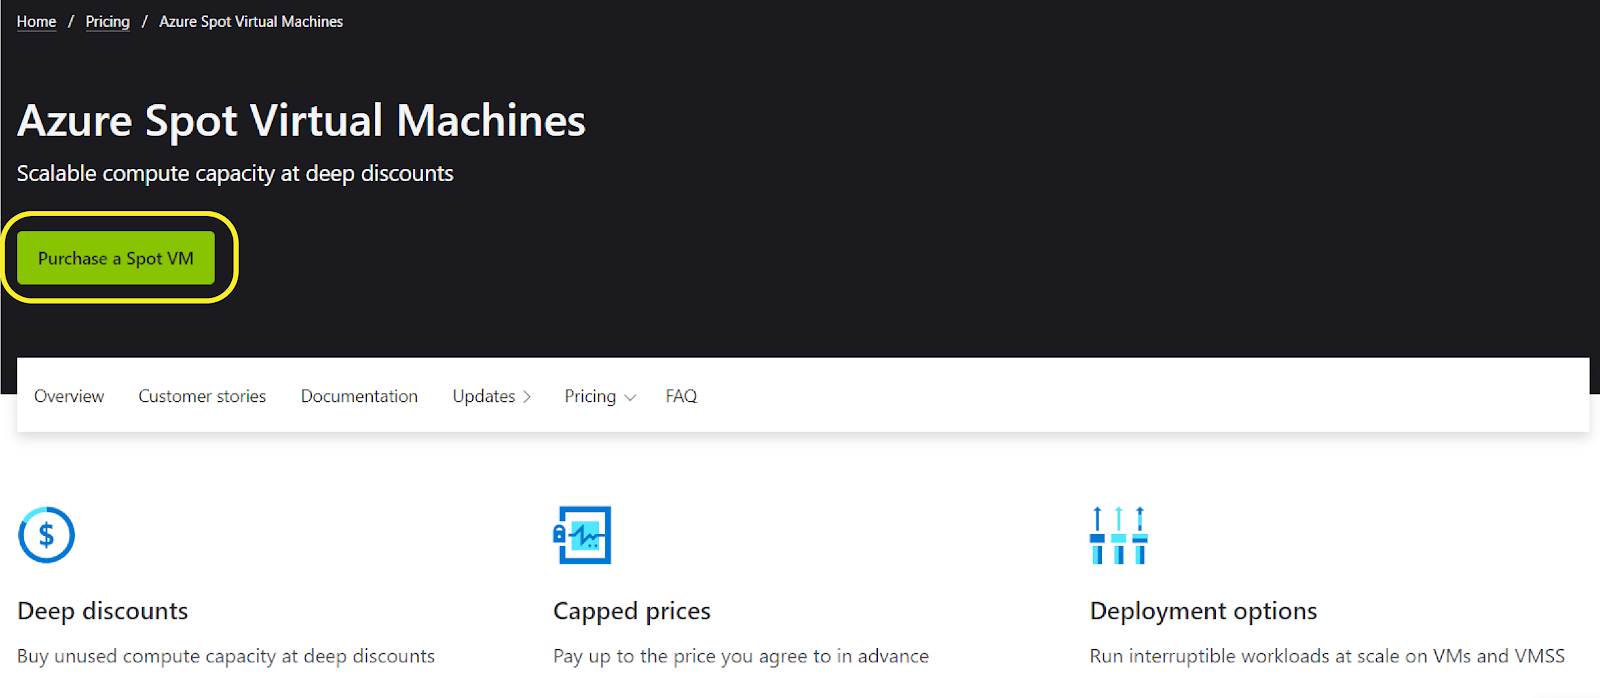 Azure Spot Virtual Machines